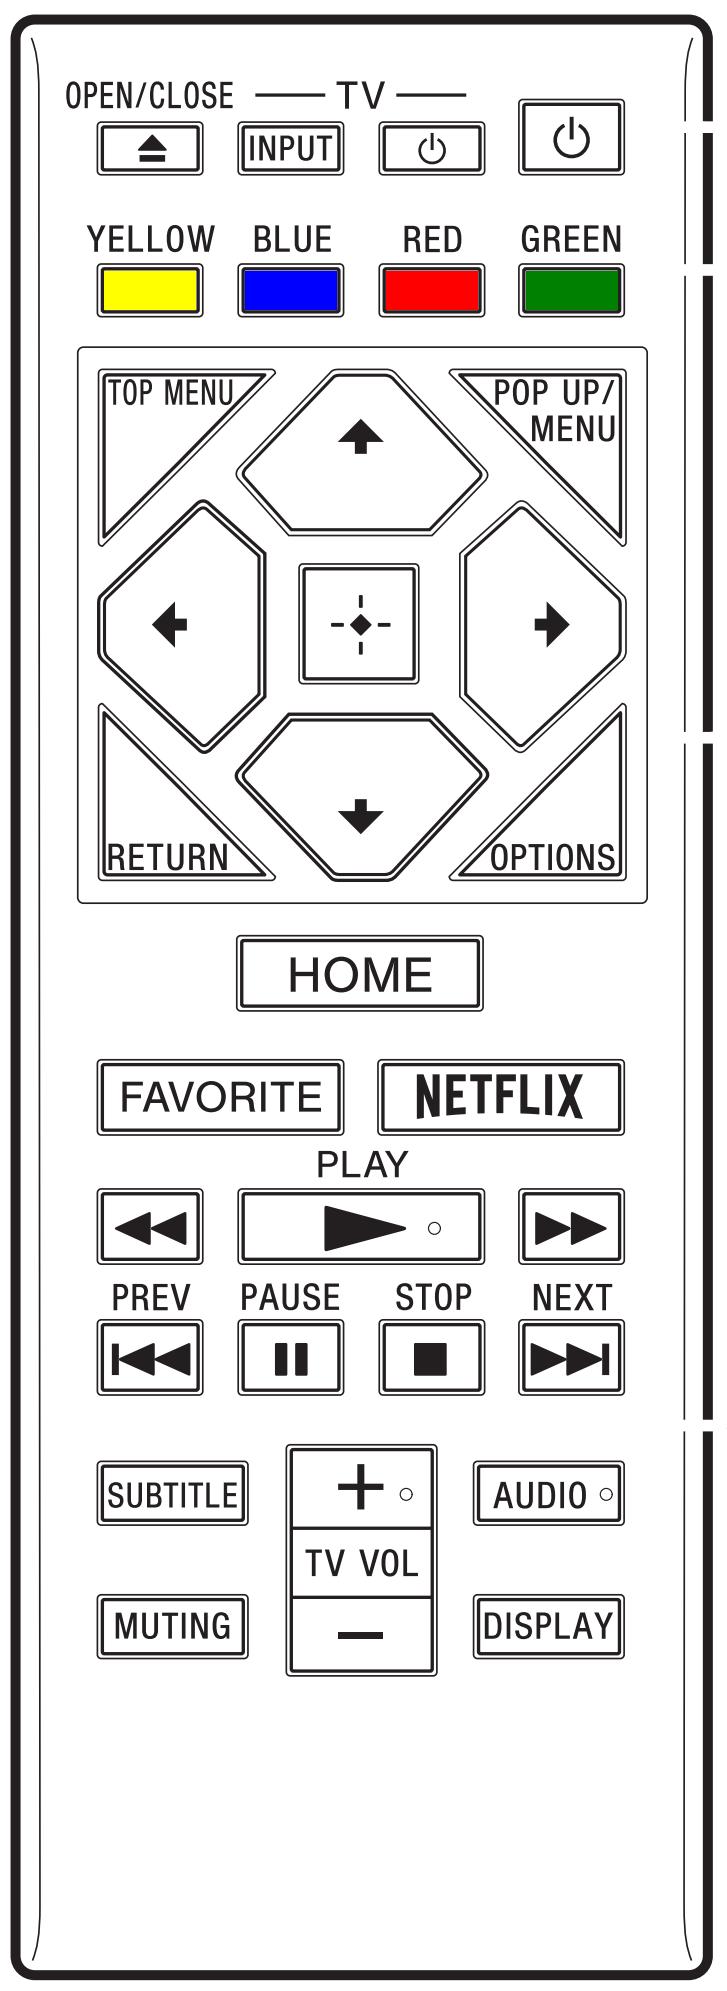 Diagram of Remote